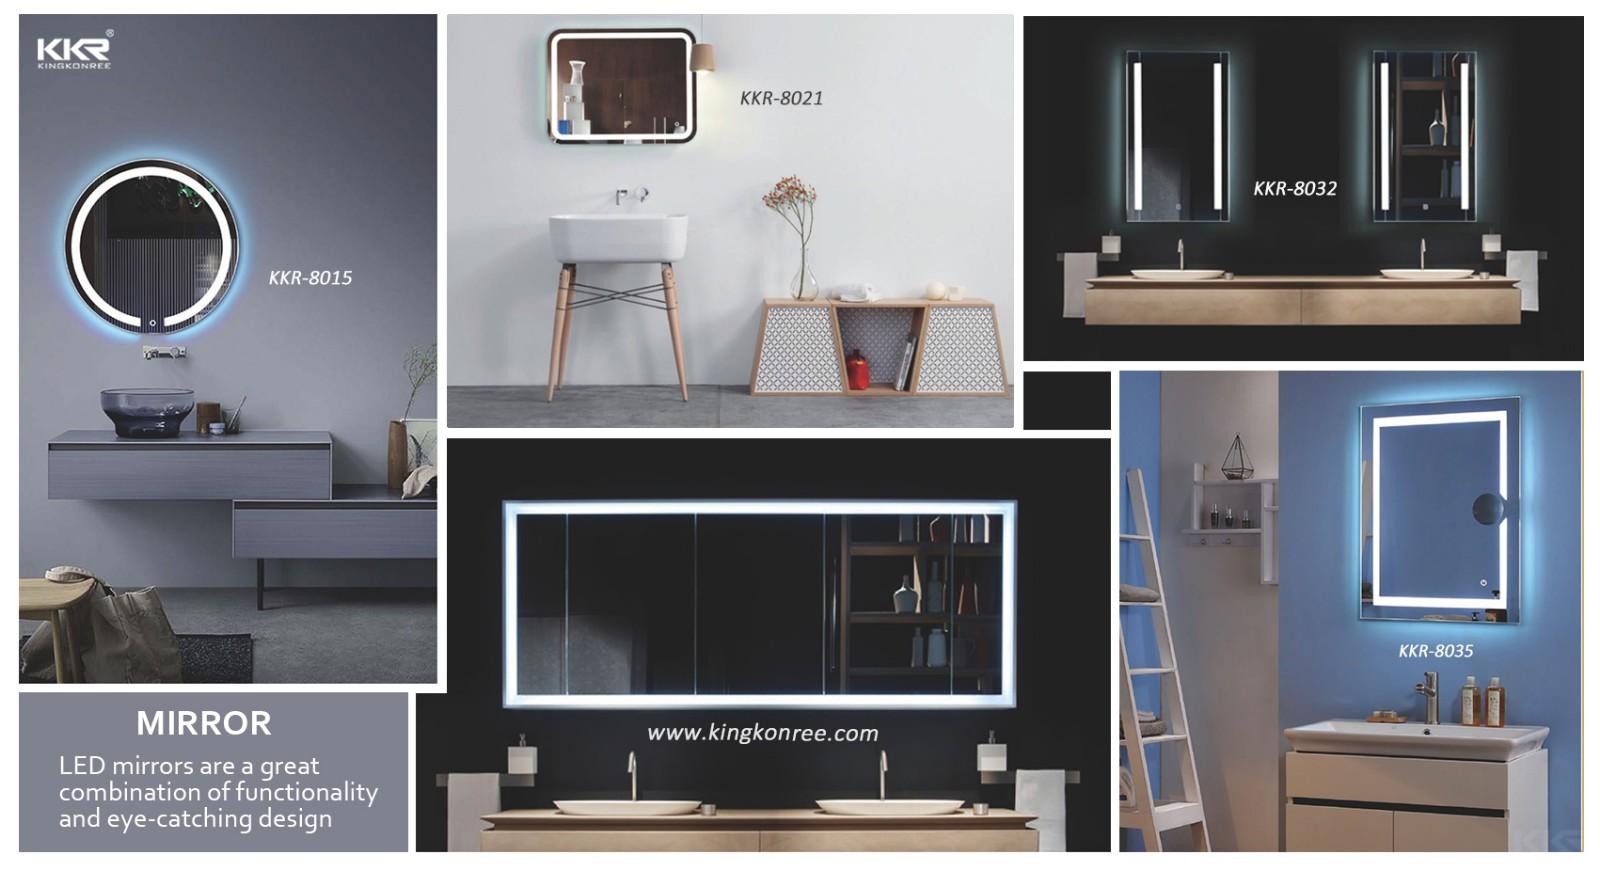 KingKonree led light washroom mirrors high-end for toilet-2